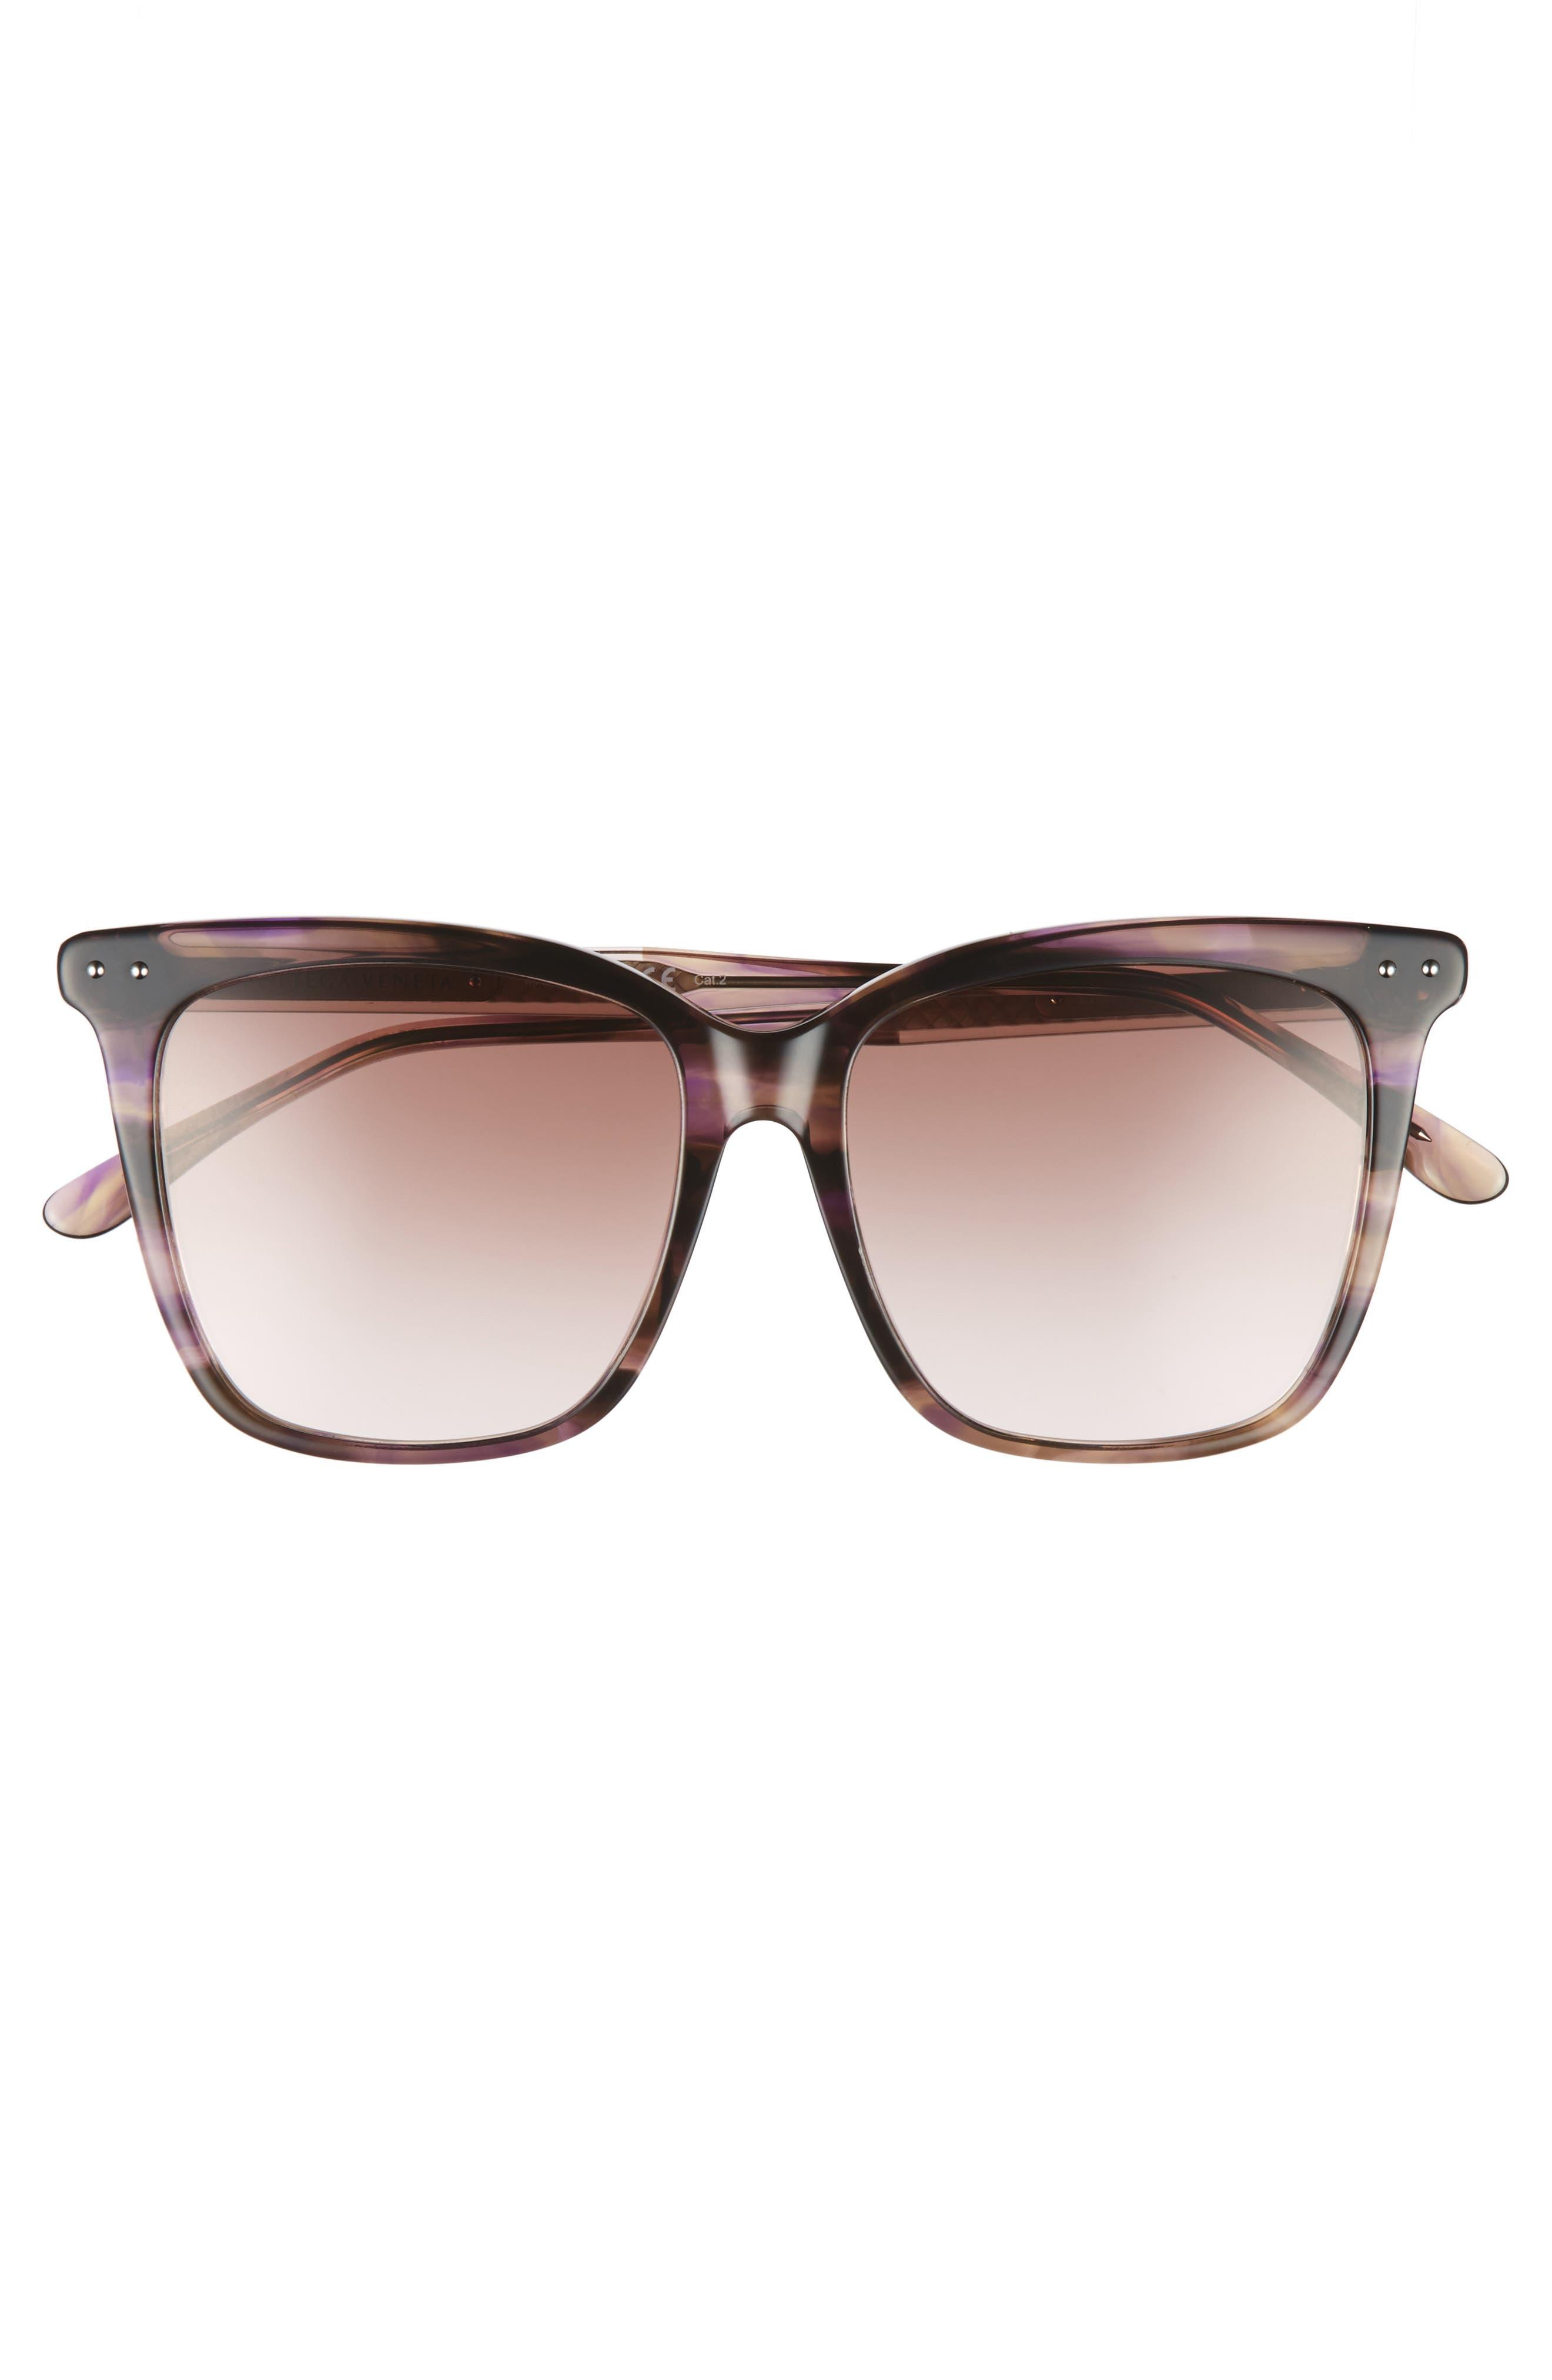 54mm Square Sunglasses,                             Alternate thumbnail 8, color,